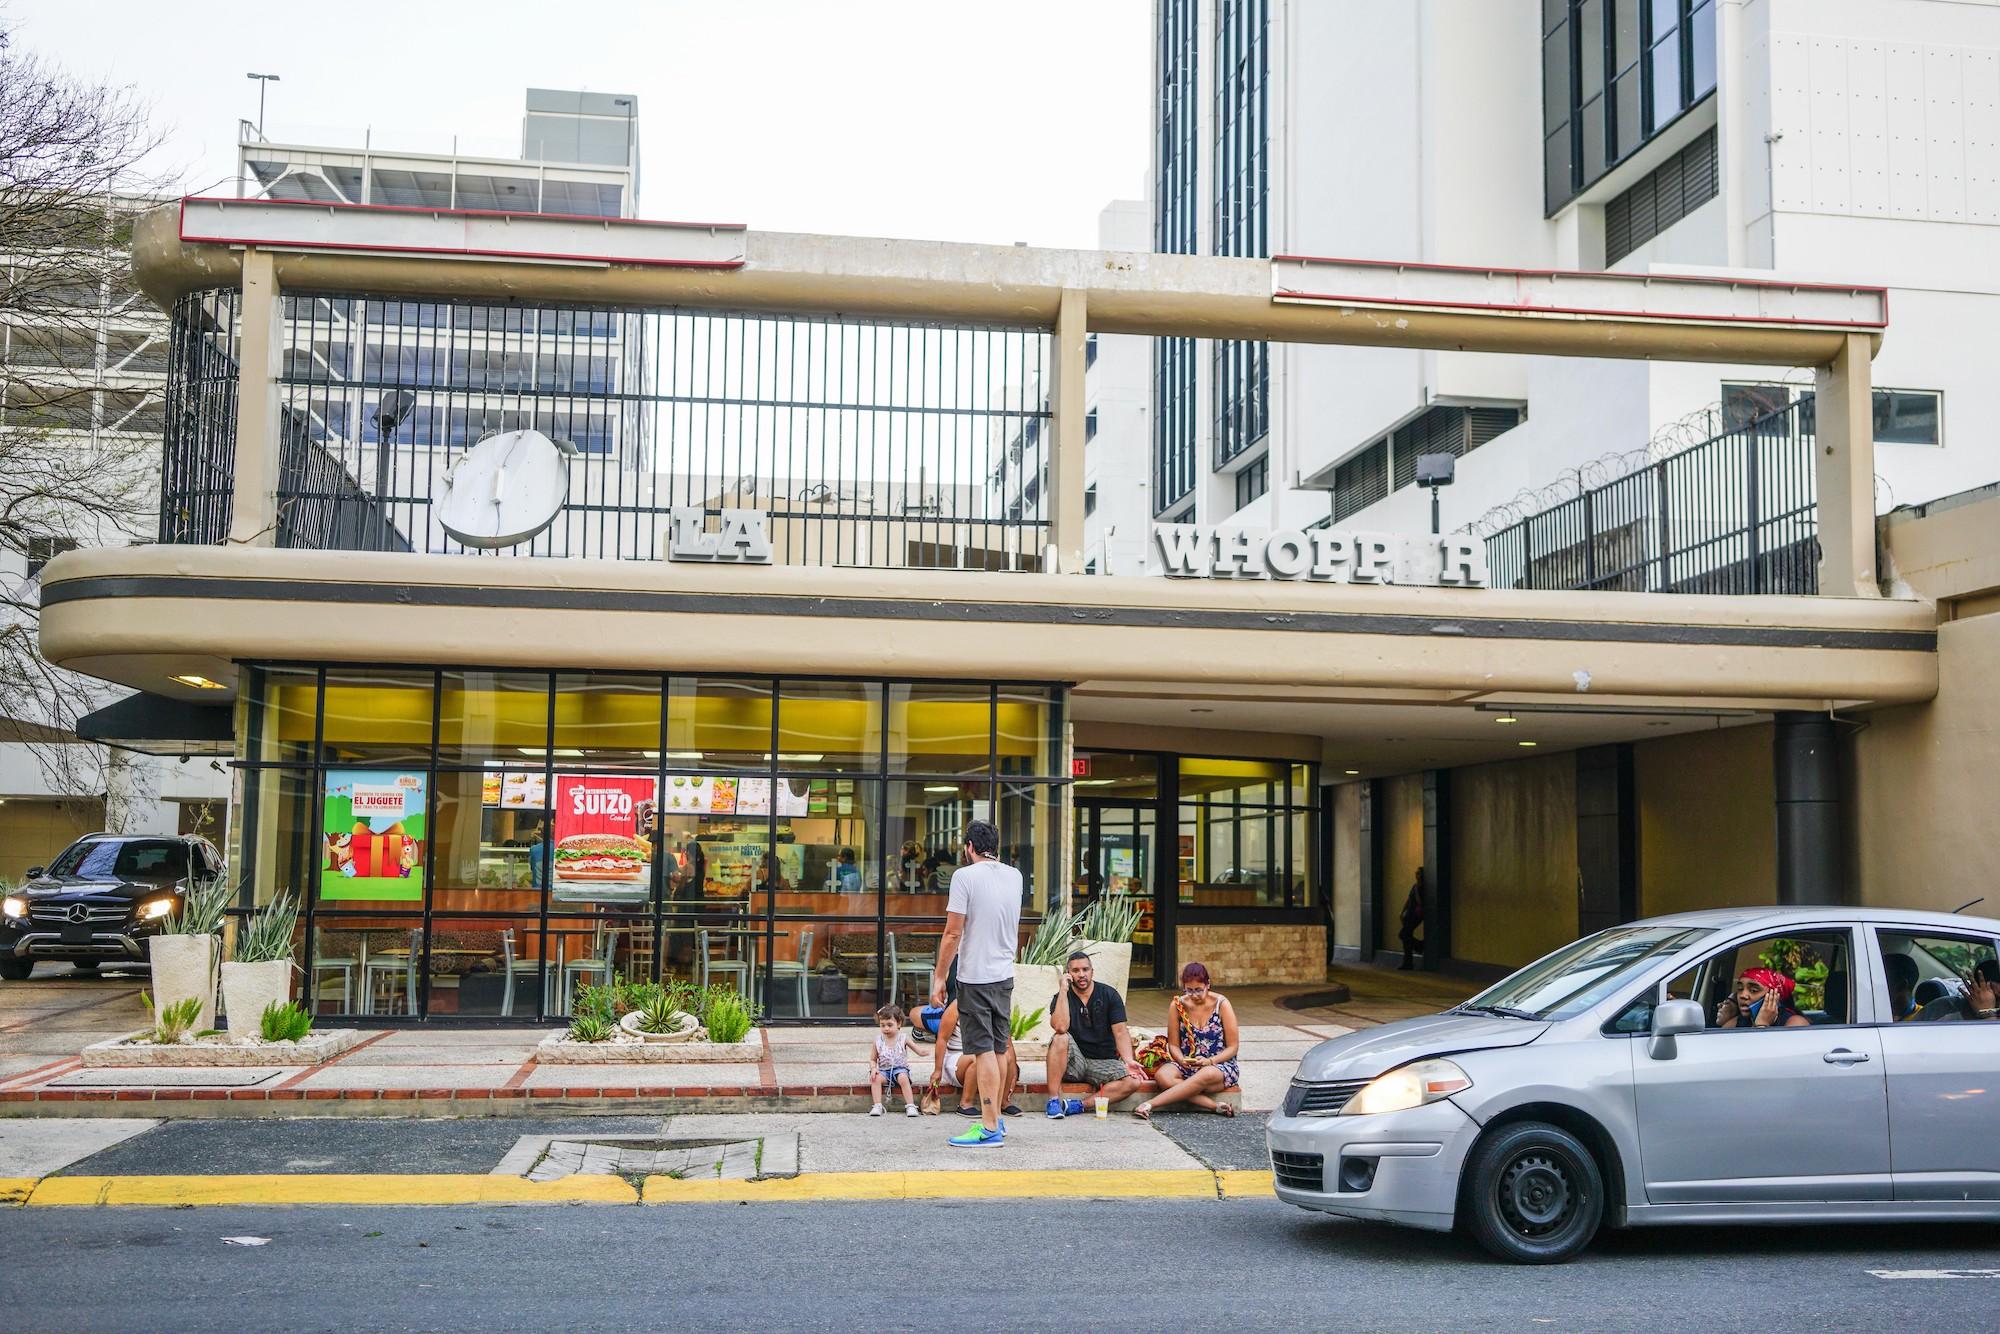 Restaurants struggle to survive in Puerto Rico